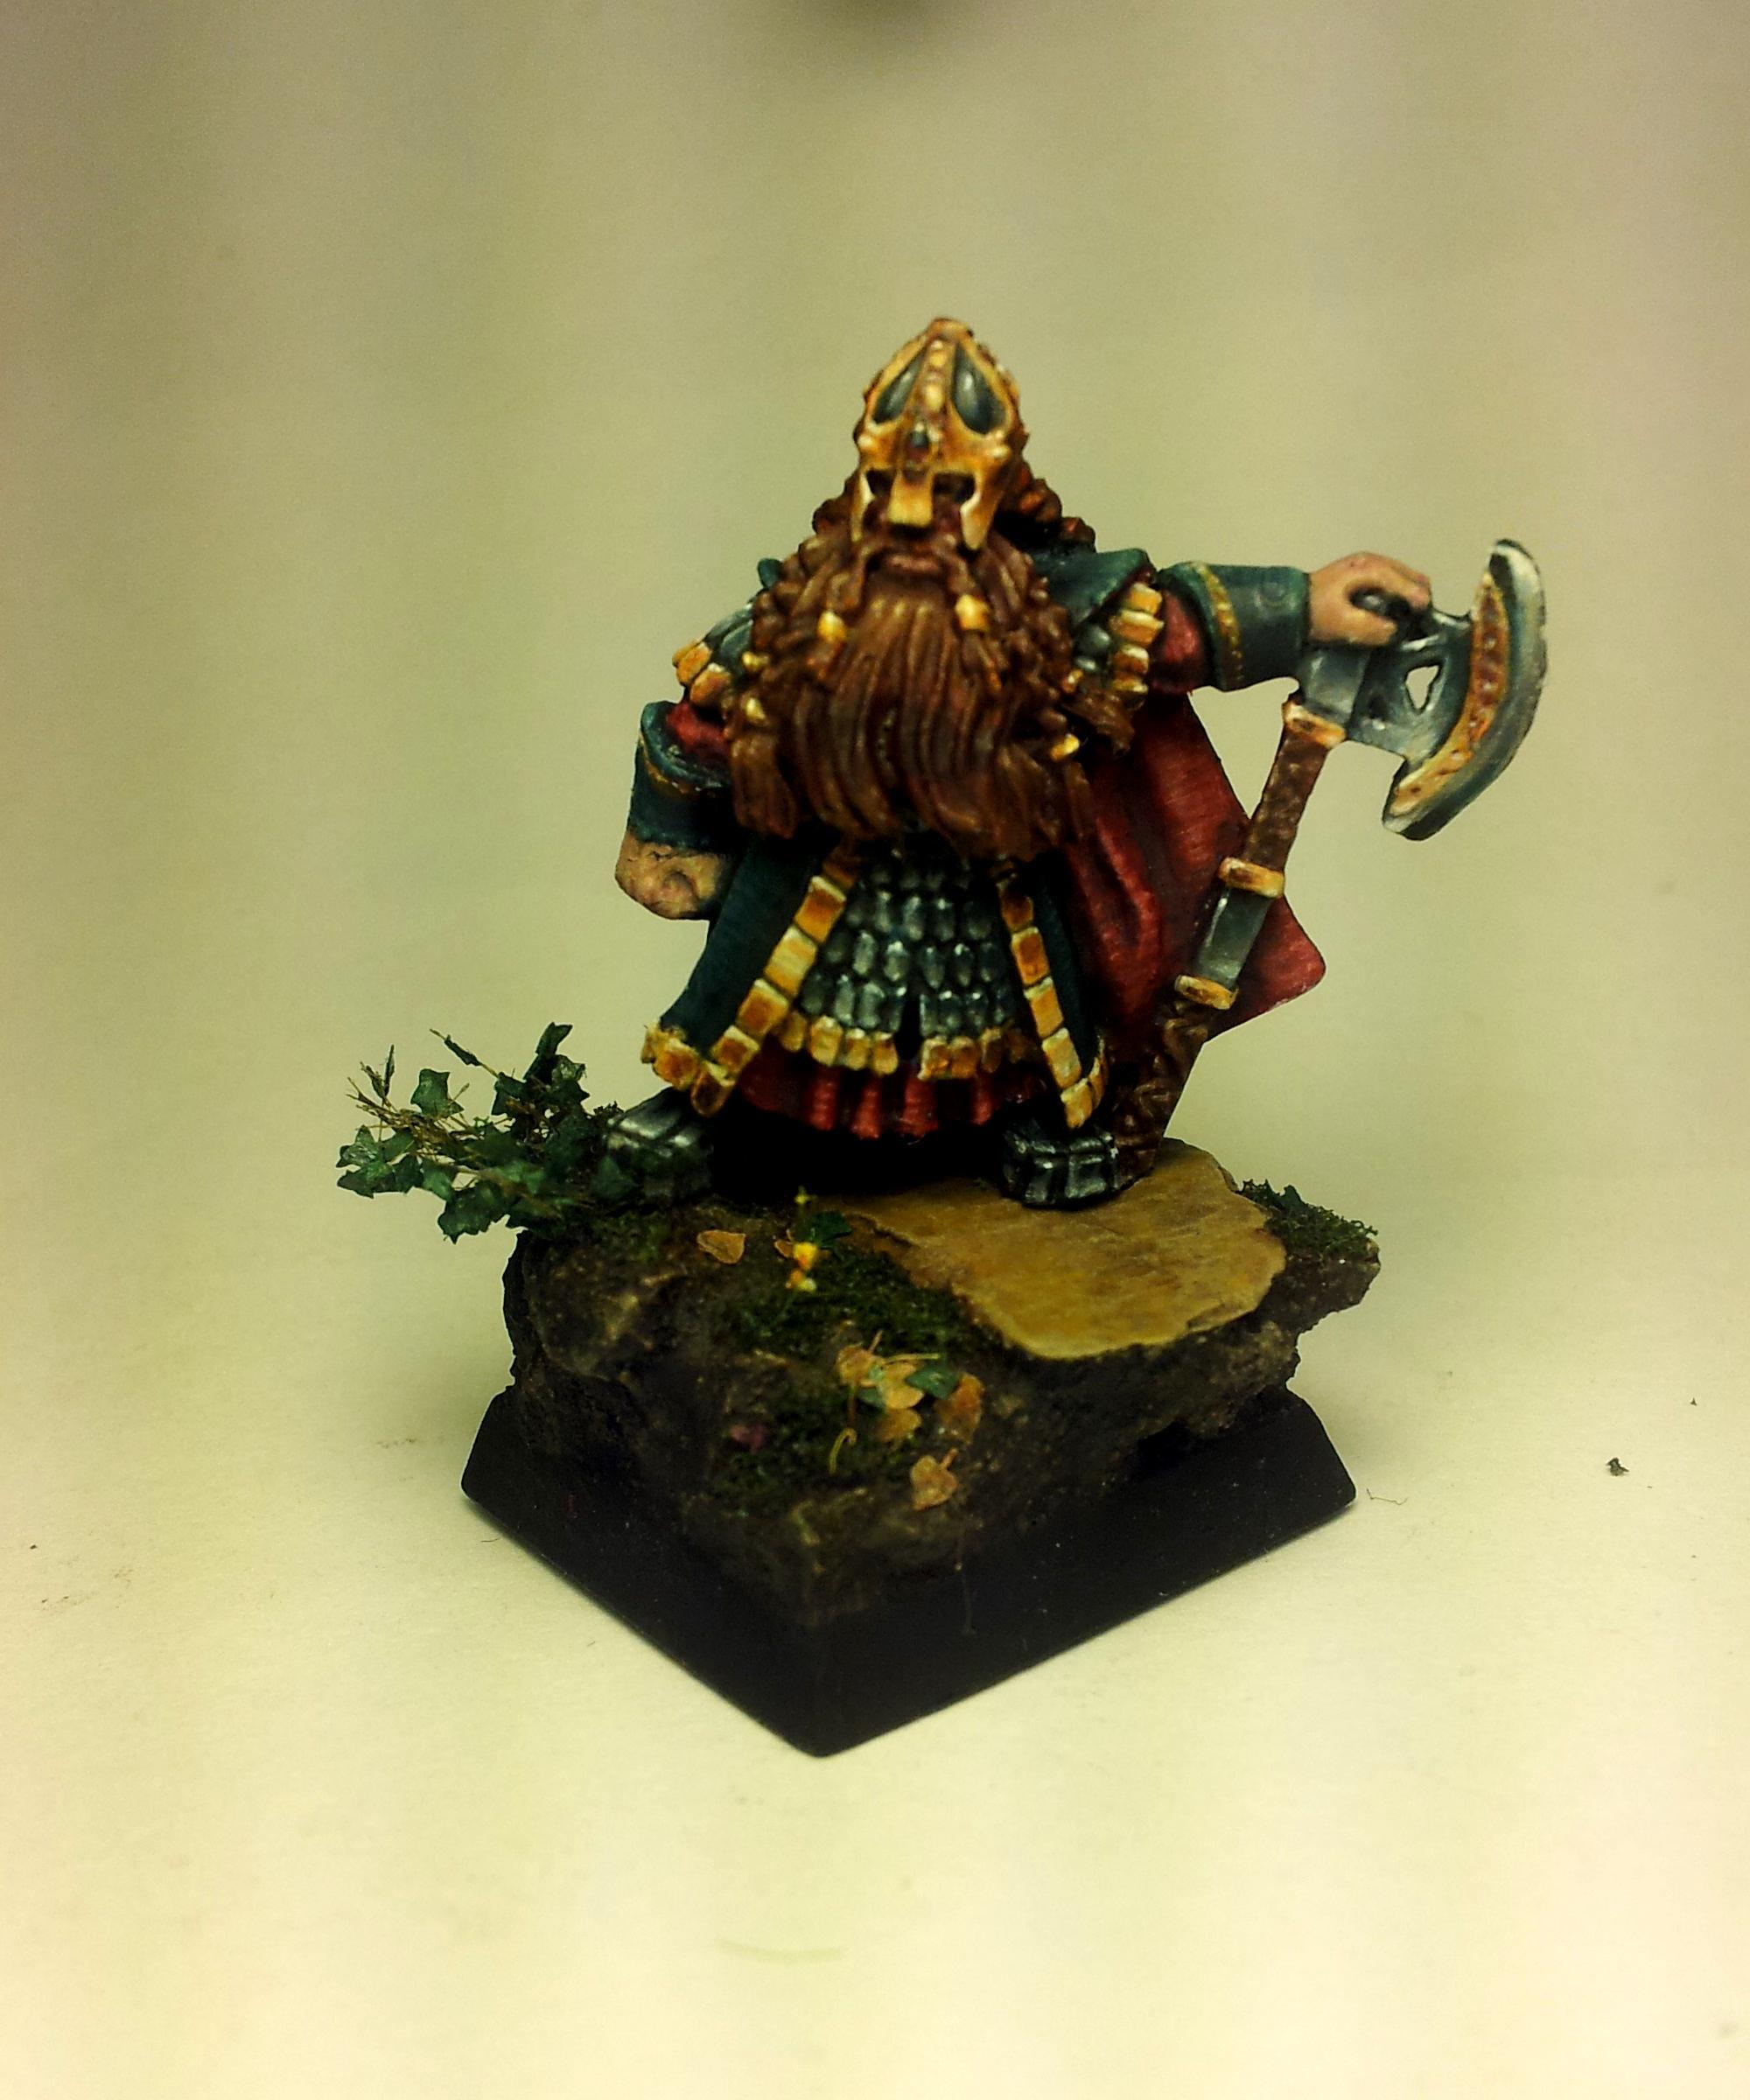 Balin, Dwarves, Lord Of The Rings, Non-Metallic Metal, Scenic